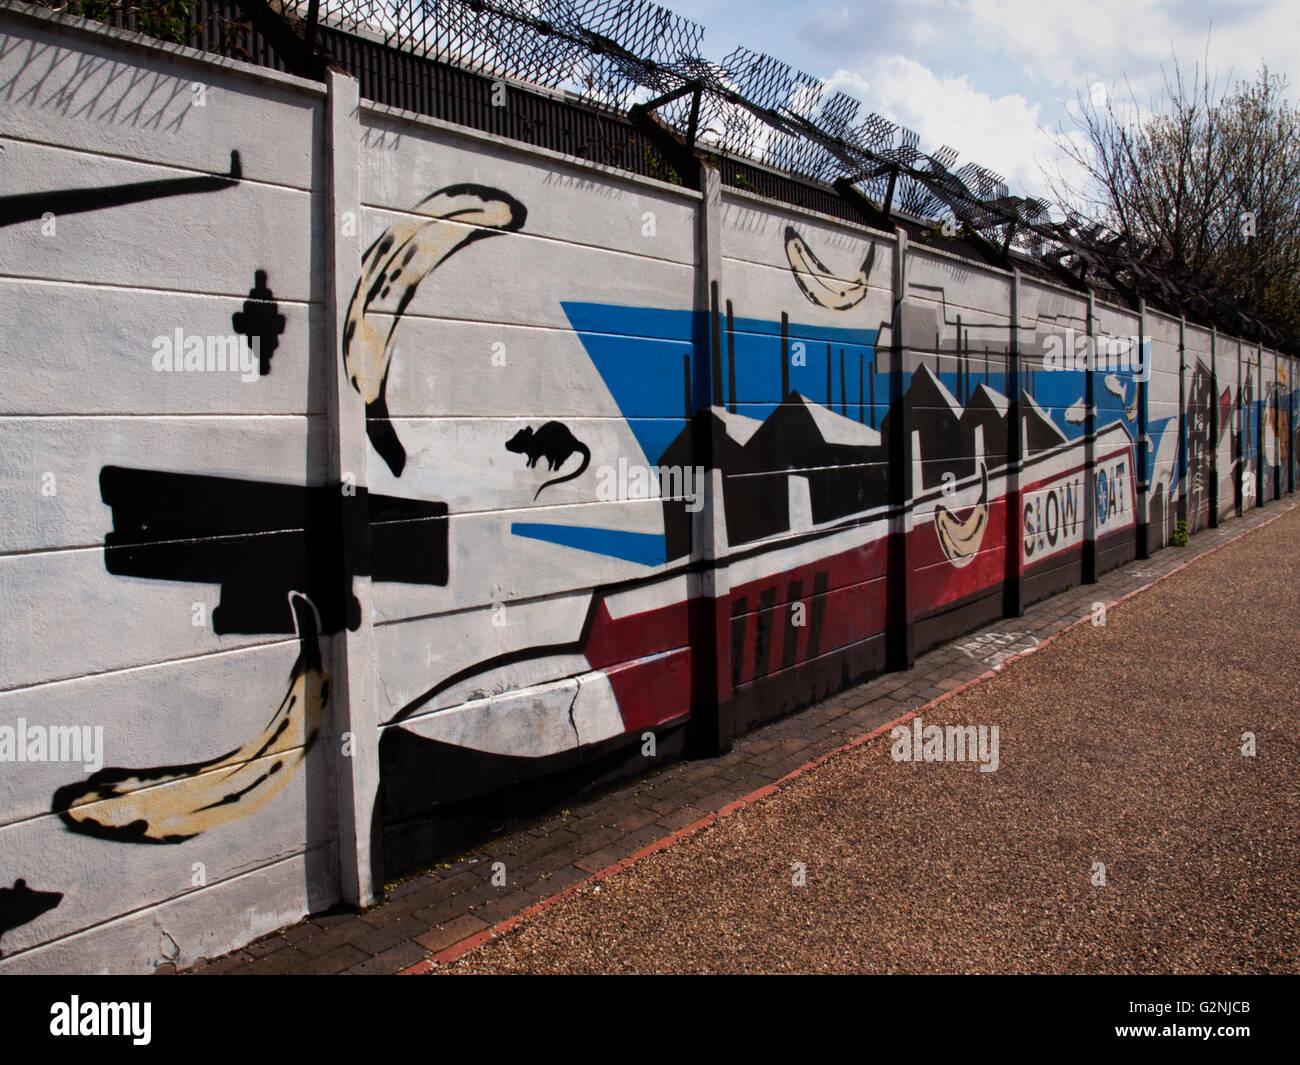 Grand Union Canal Urban Art/Graffiti - Stock Image